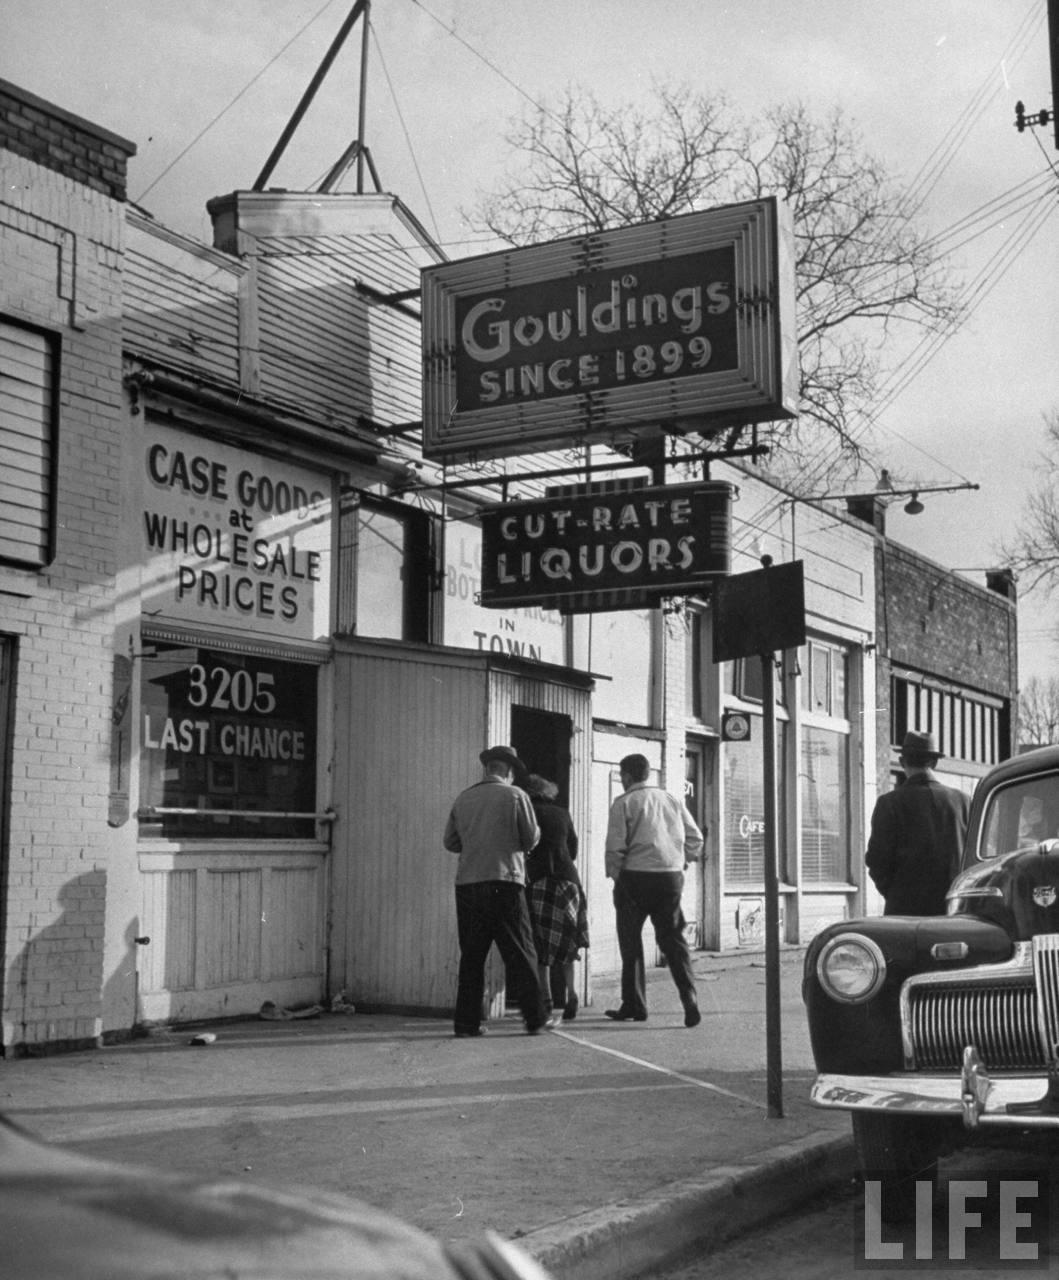 Kansas City politician Charles Binaggio and his wife, were last seen here gambling.